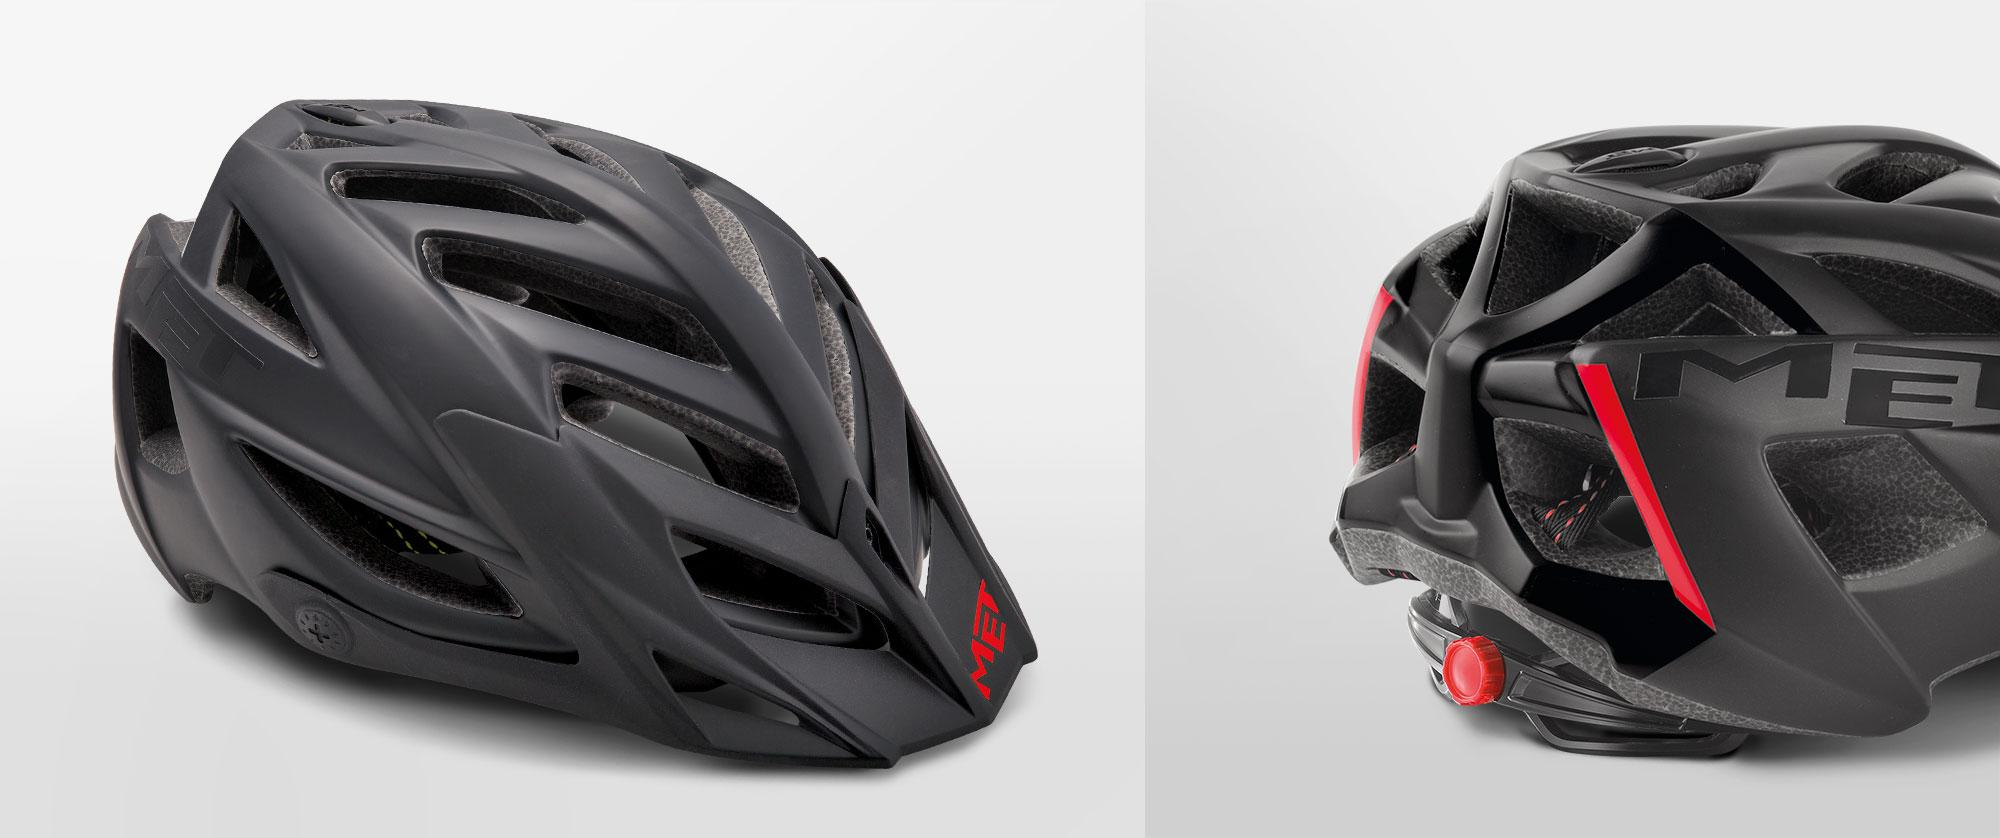 Bike Helmets For Sale Cycling Online Brands Prices Lixada Mountain Helmet Met Terra Mtb Unisize 54 61cm 100 Authentic